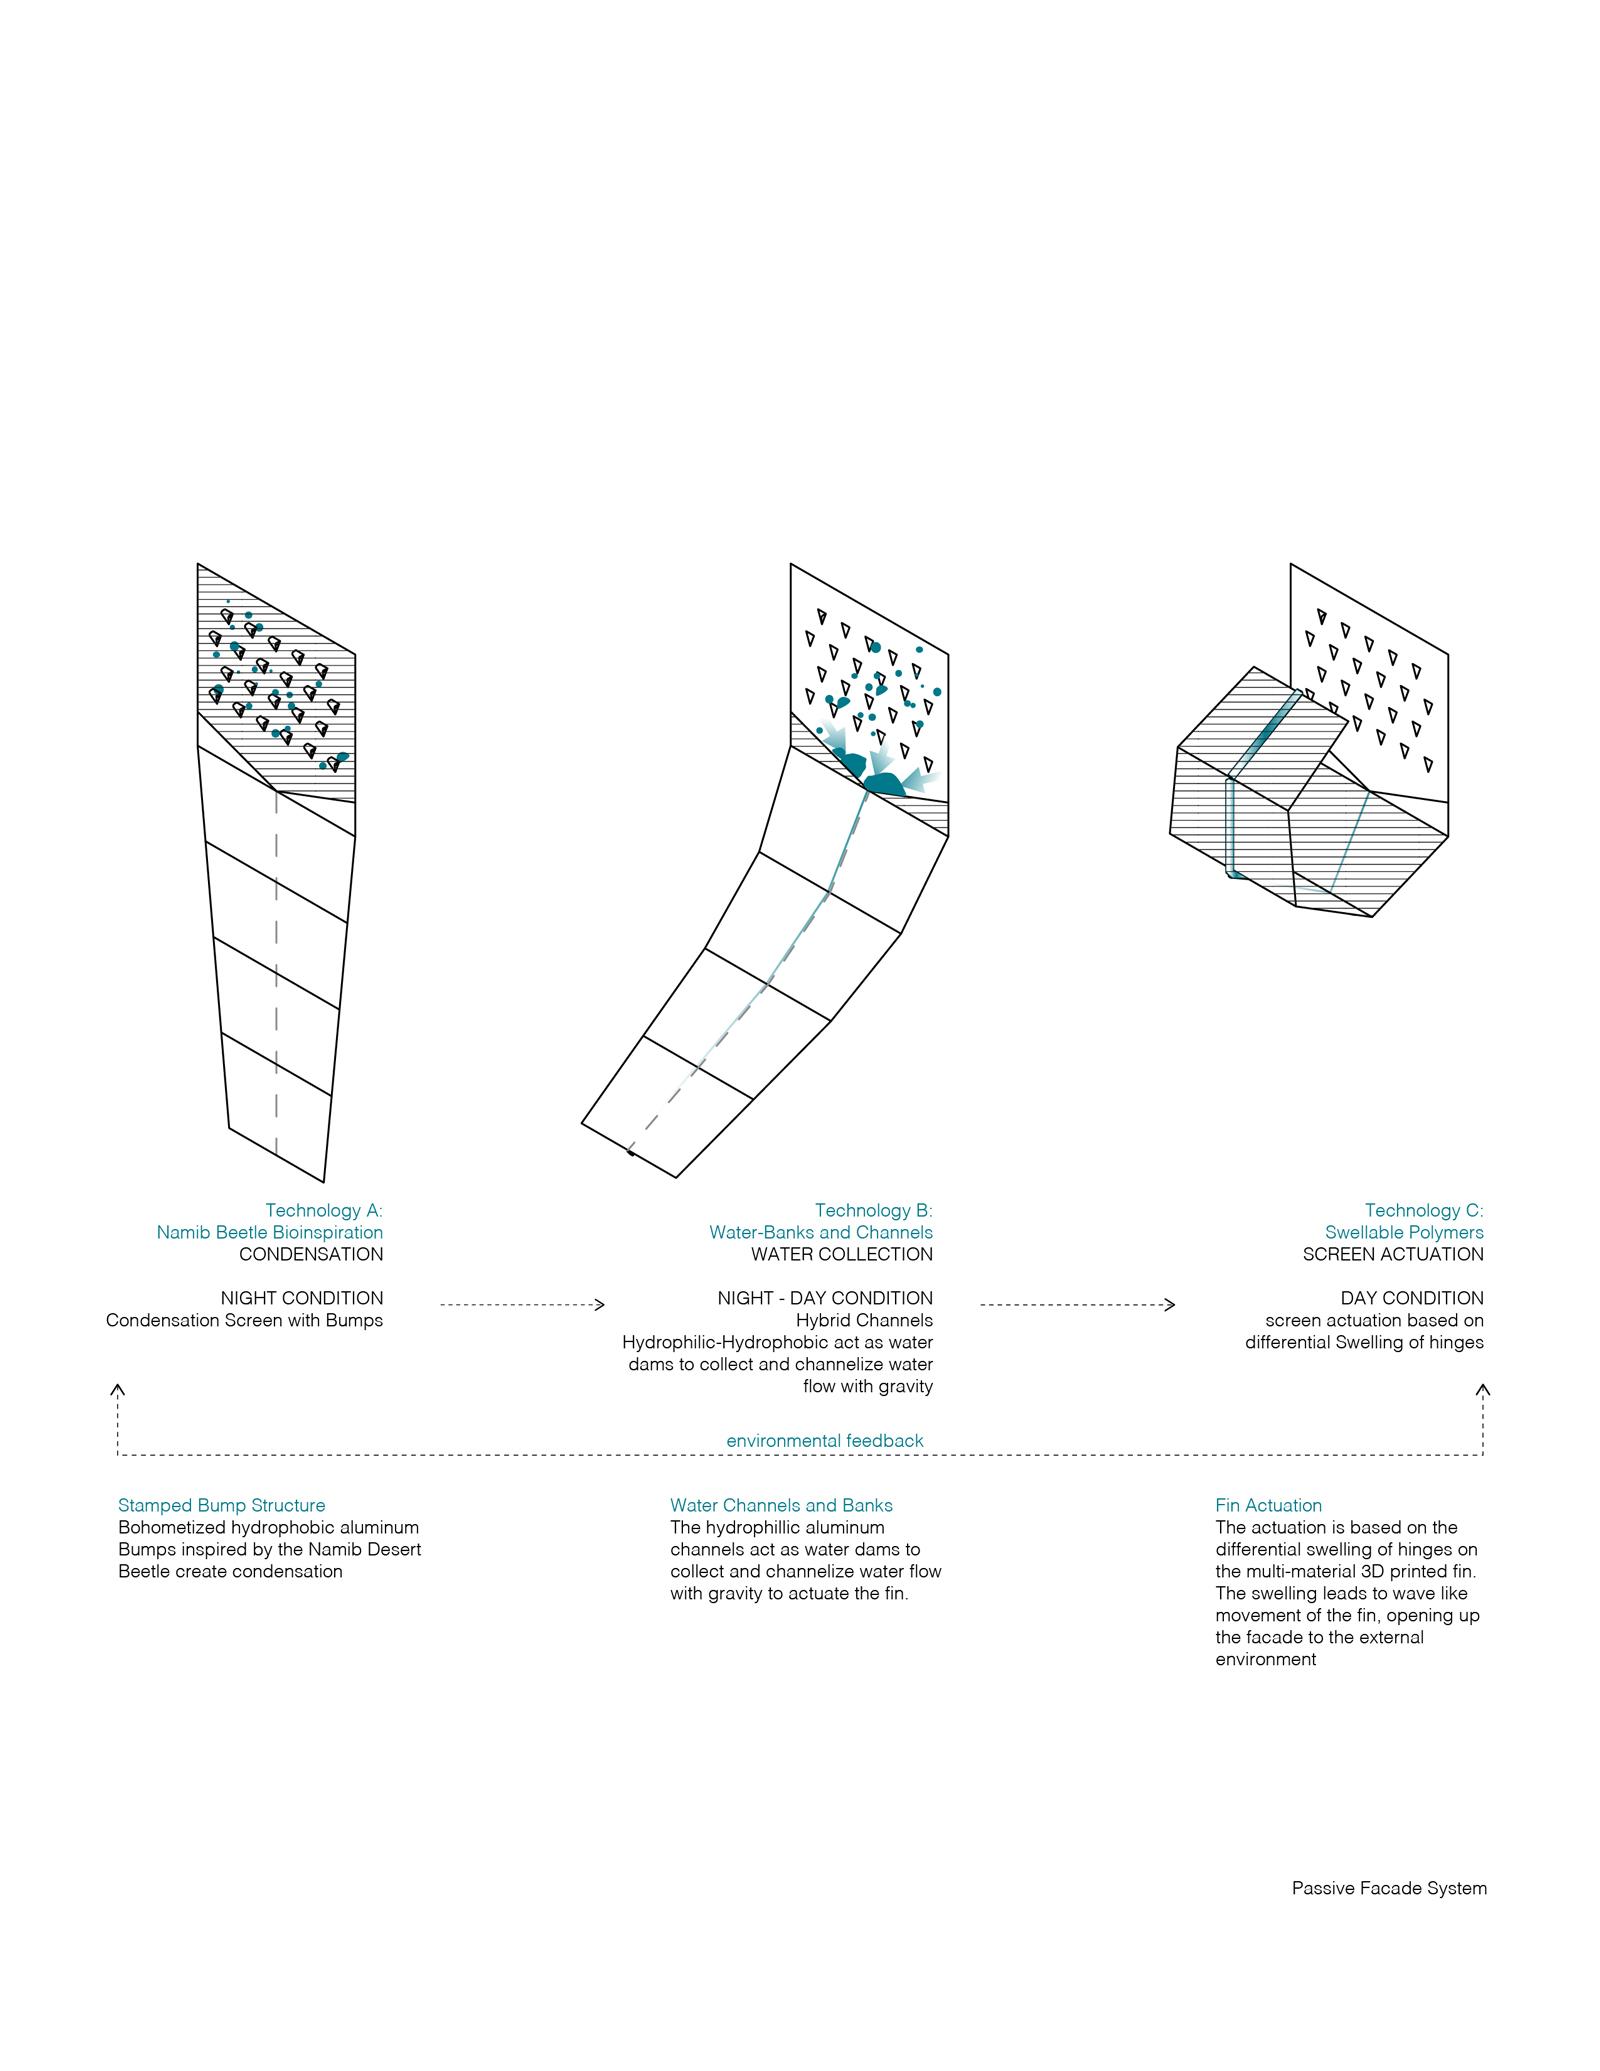 rheotile_technology-02.jpg